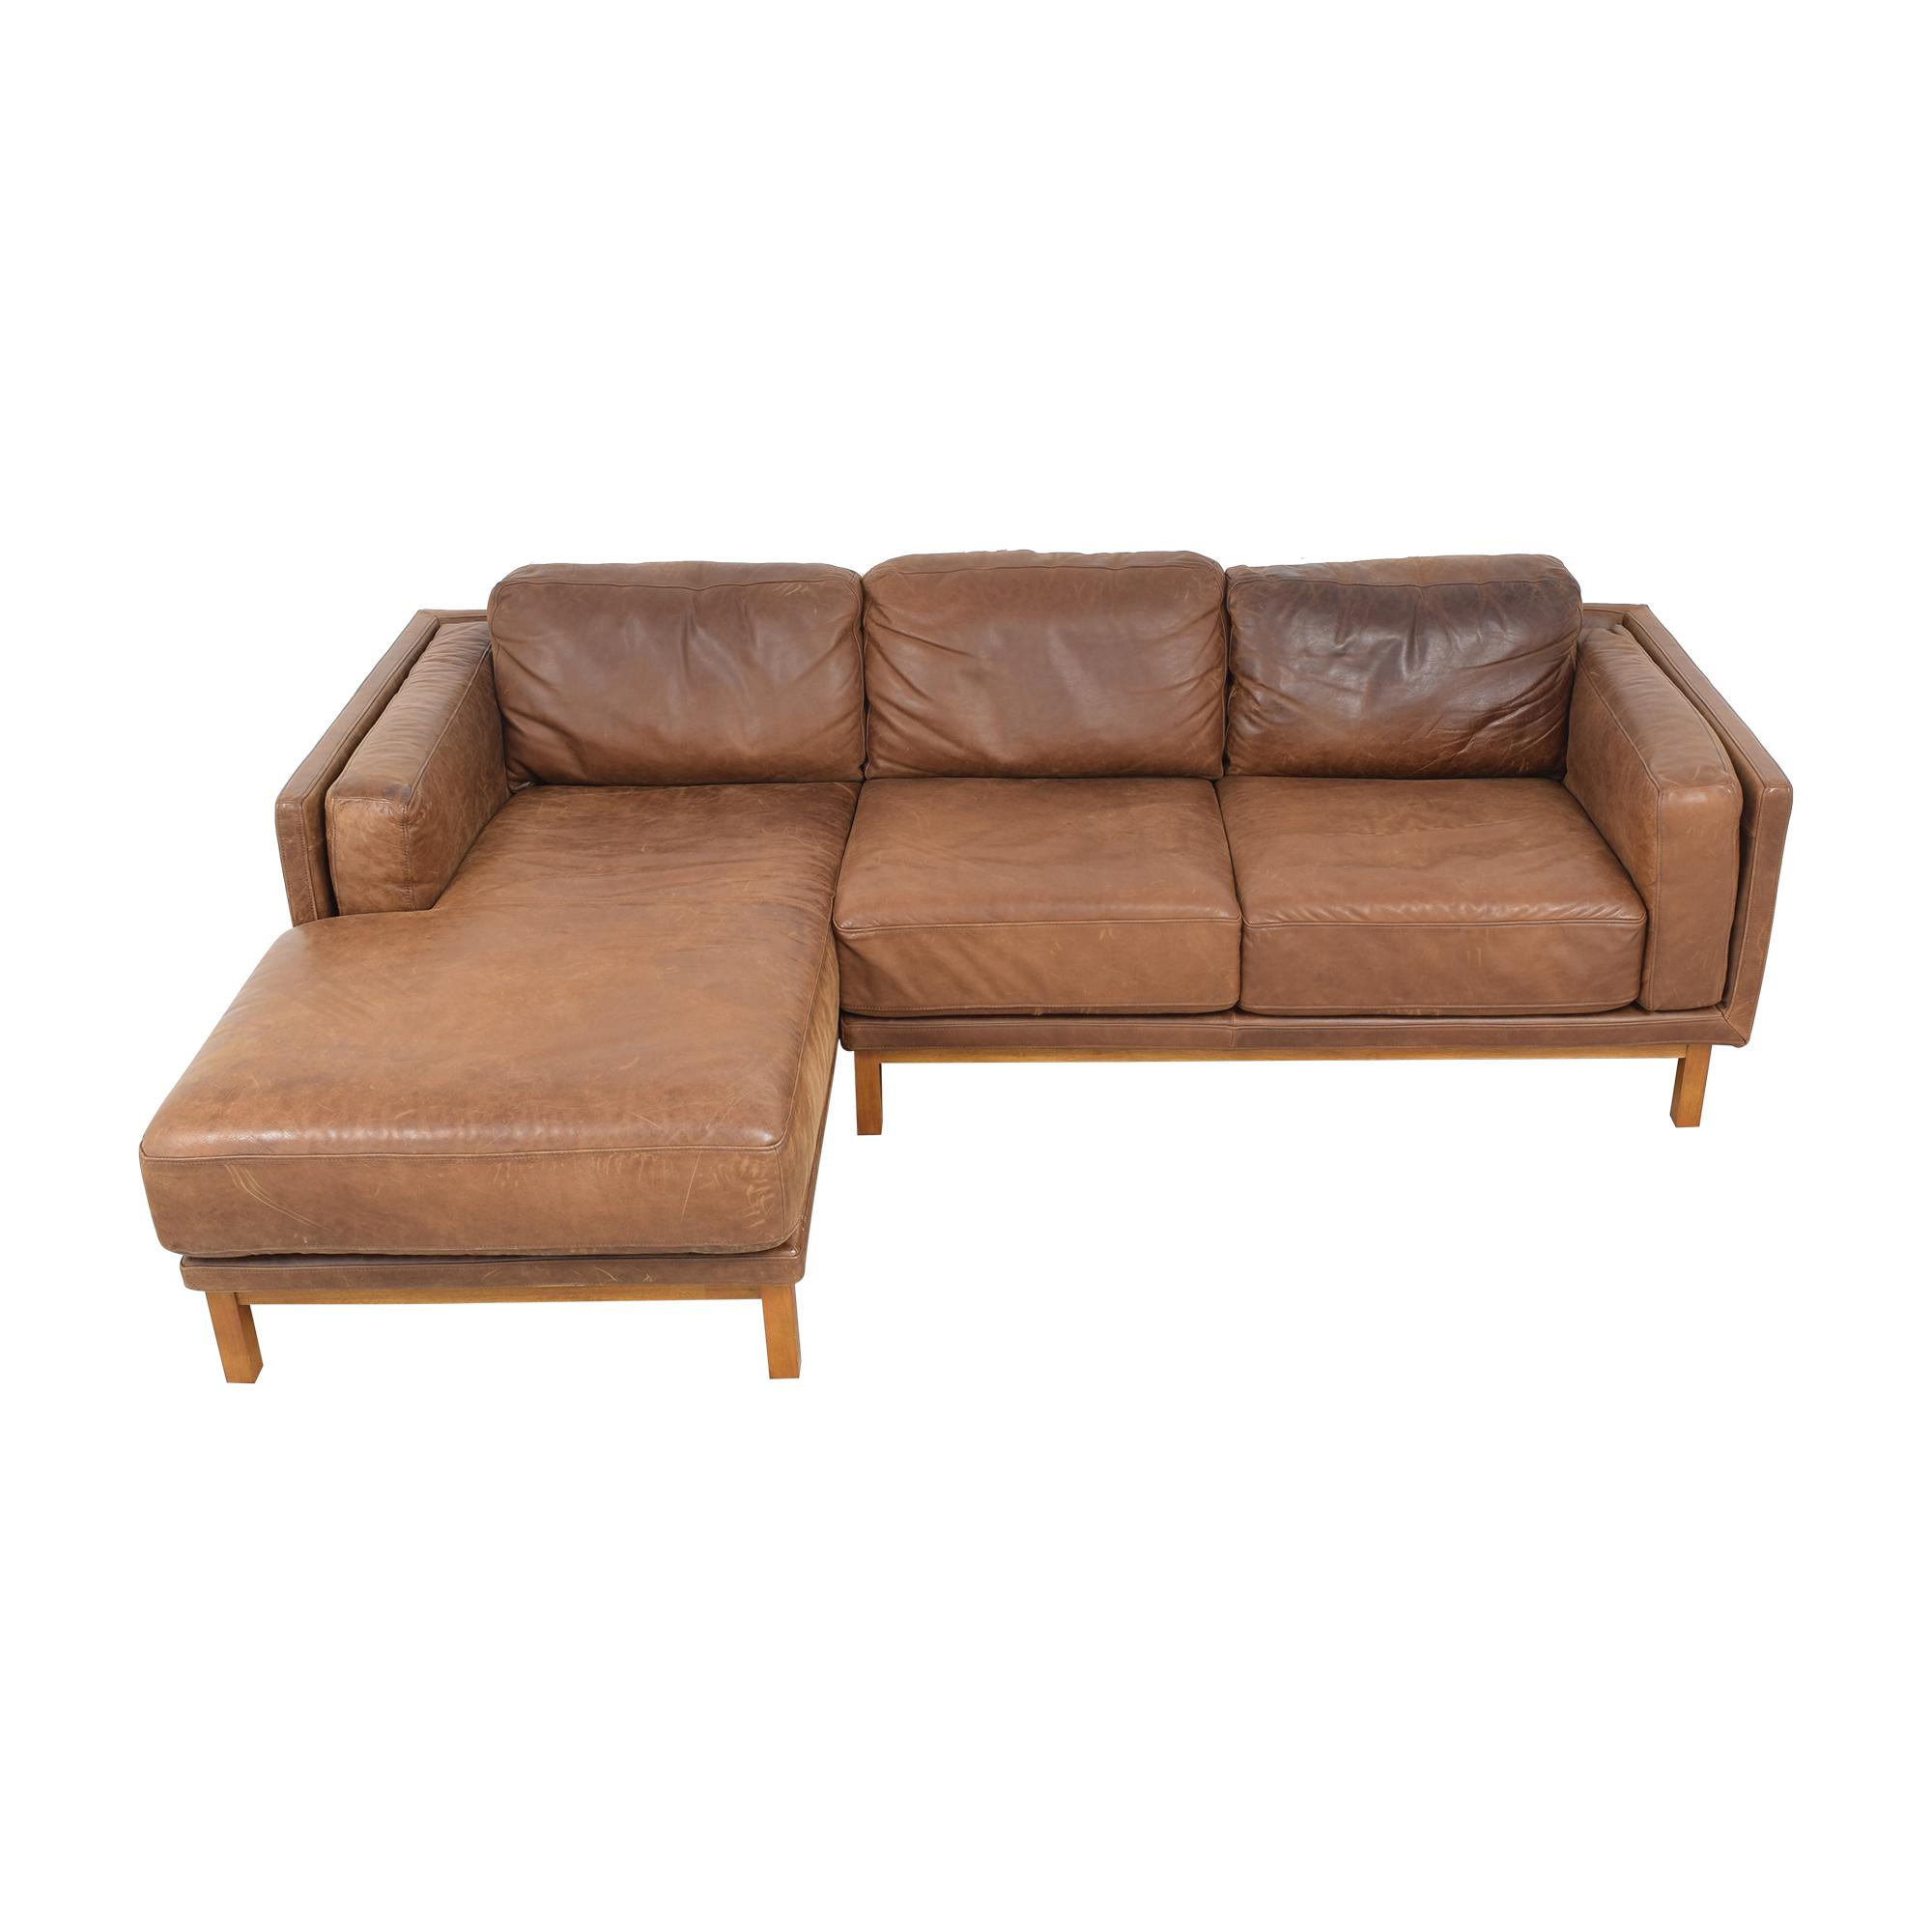 West Elm Dekalb Leather 2-Piece Chaise Sectional sale